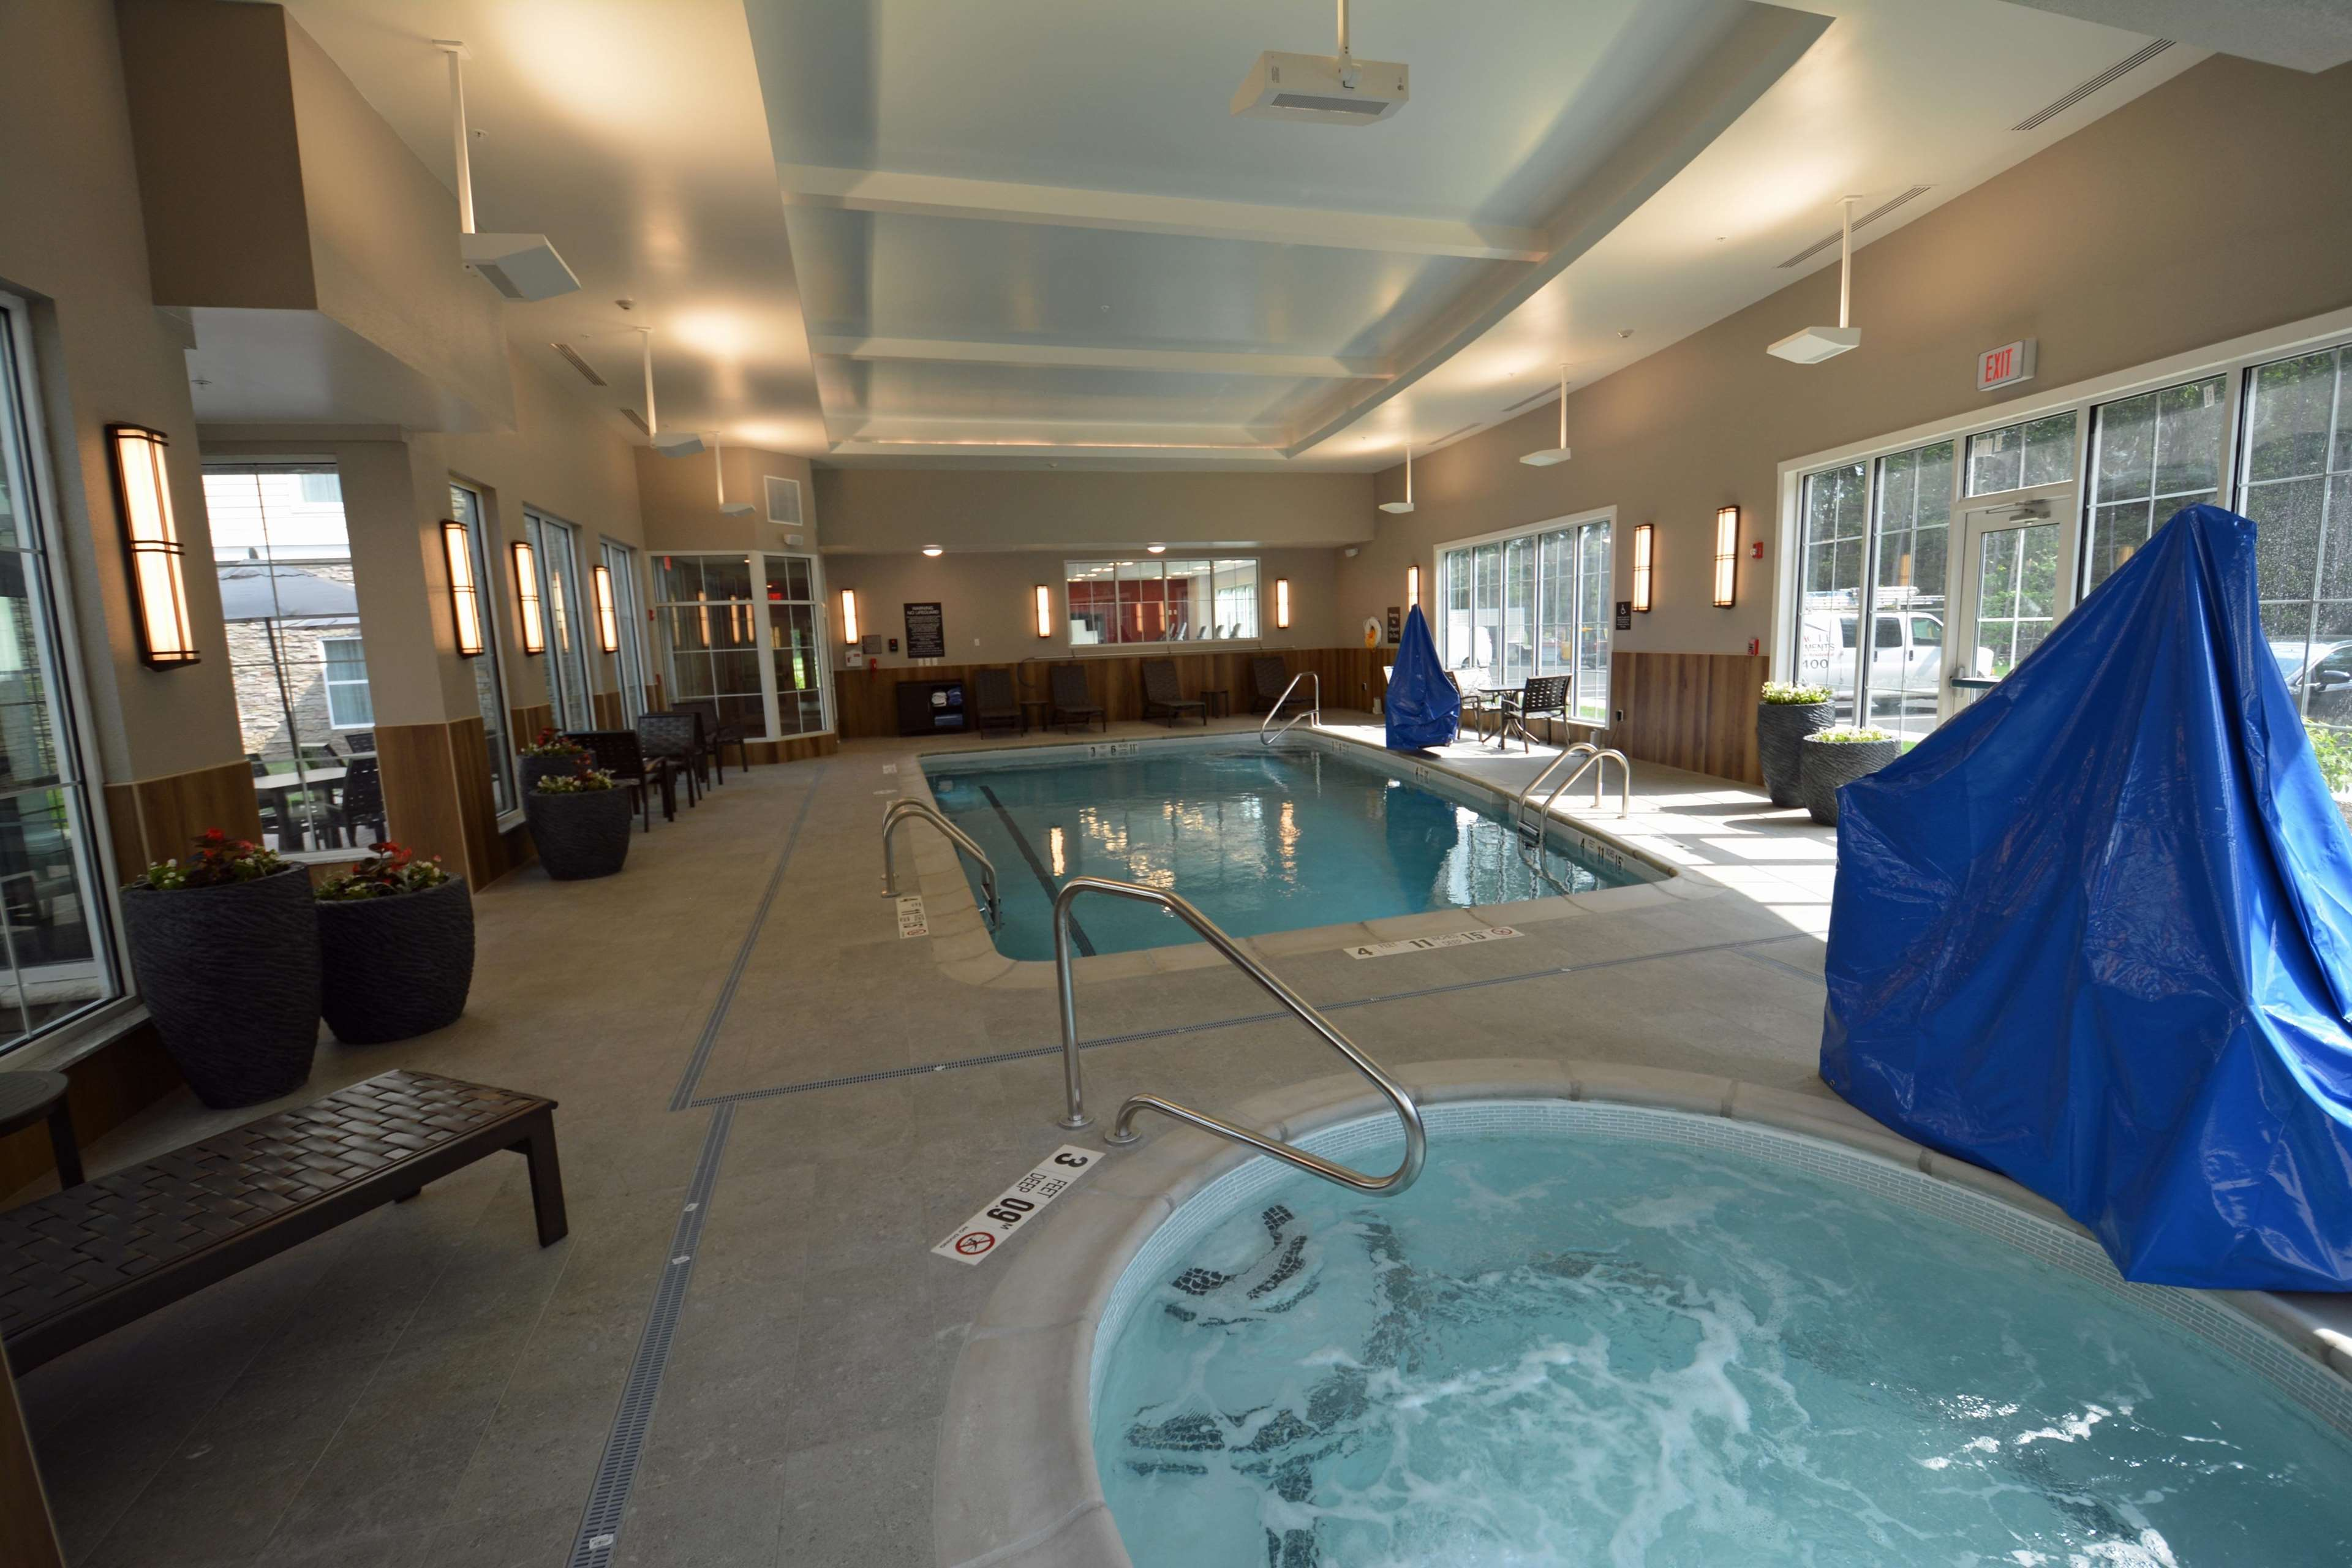 Homewood Suites by Hilton Saratoga Springs image 0